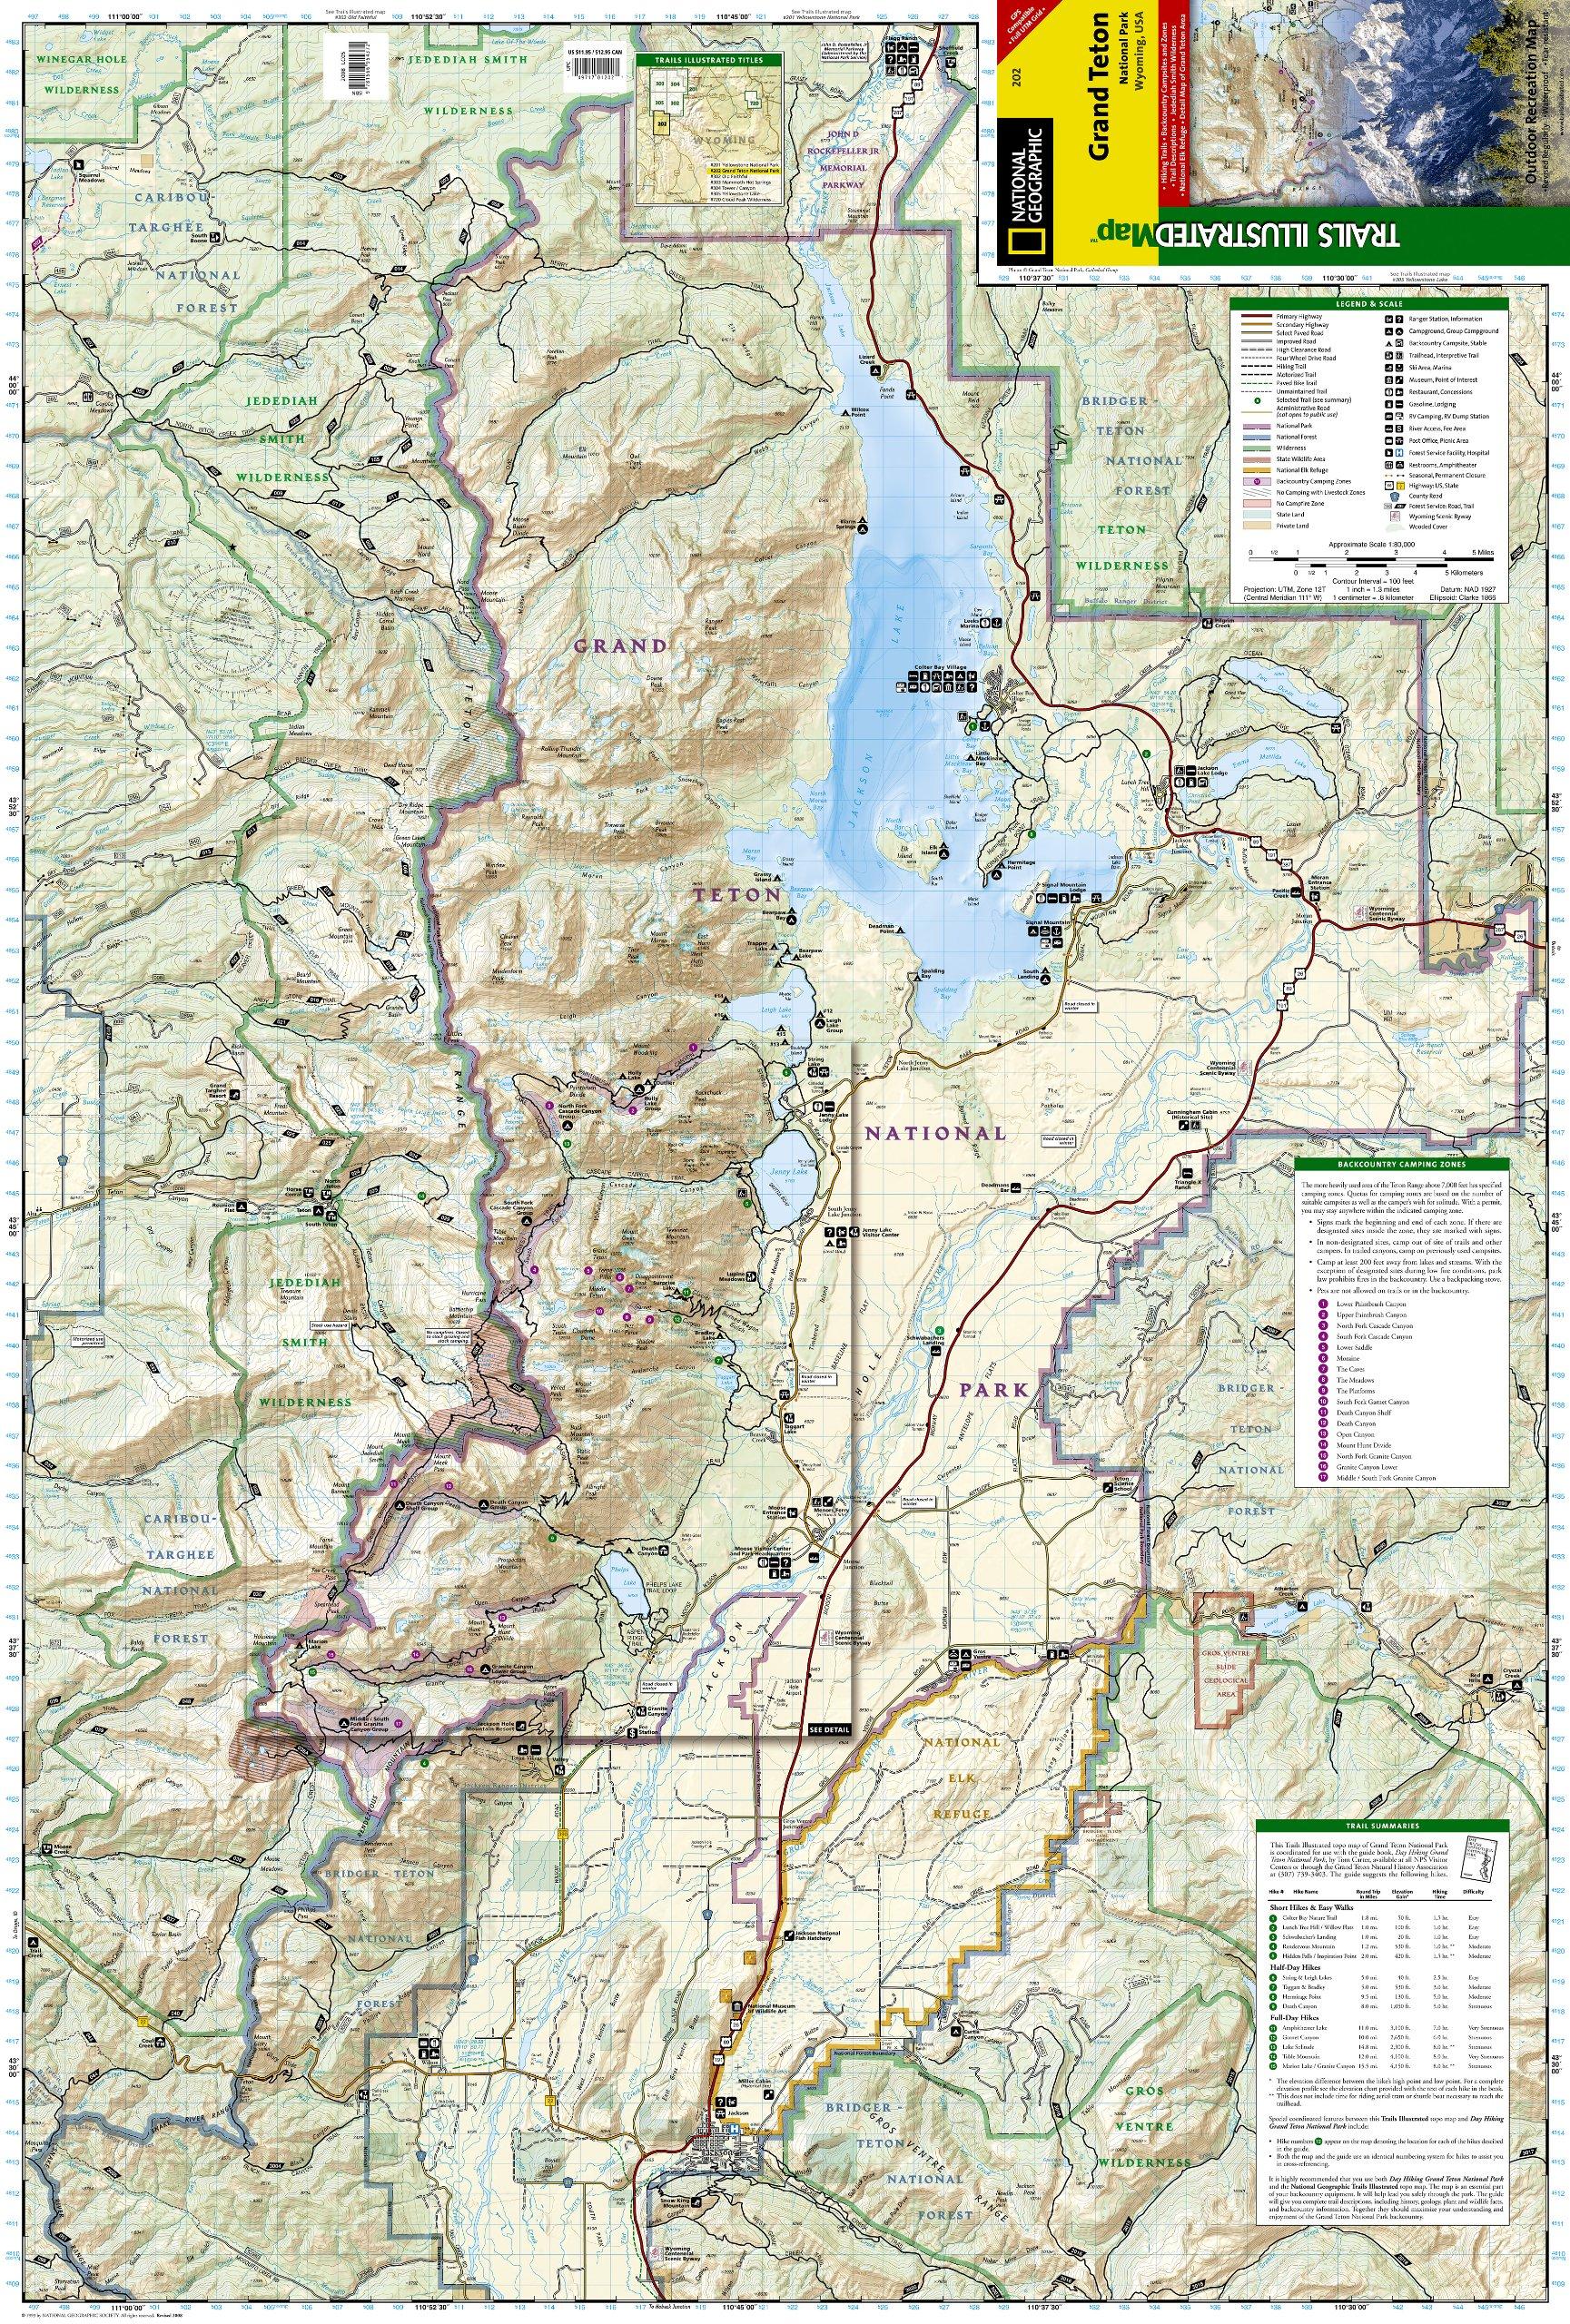 Grand Teton National Park National Geographic Trails Ilrated Map National Geographic Maps Trails Ilrated 9781566954372 Amazon Com Books